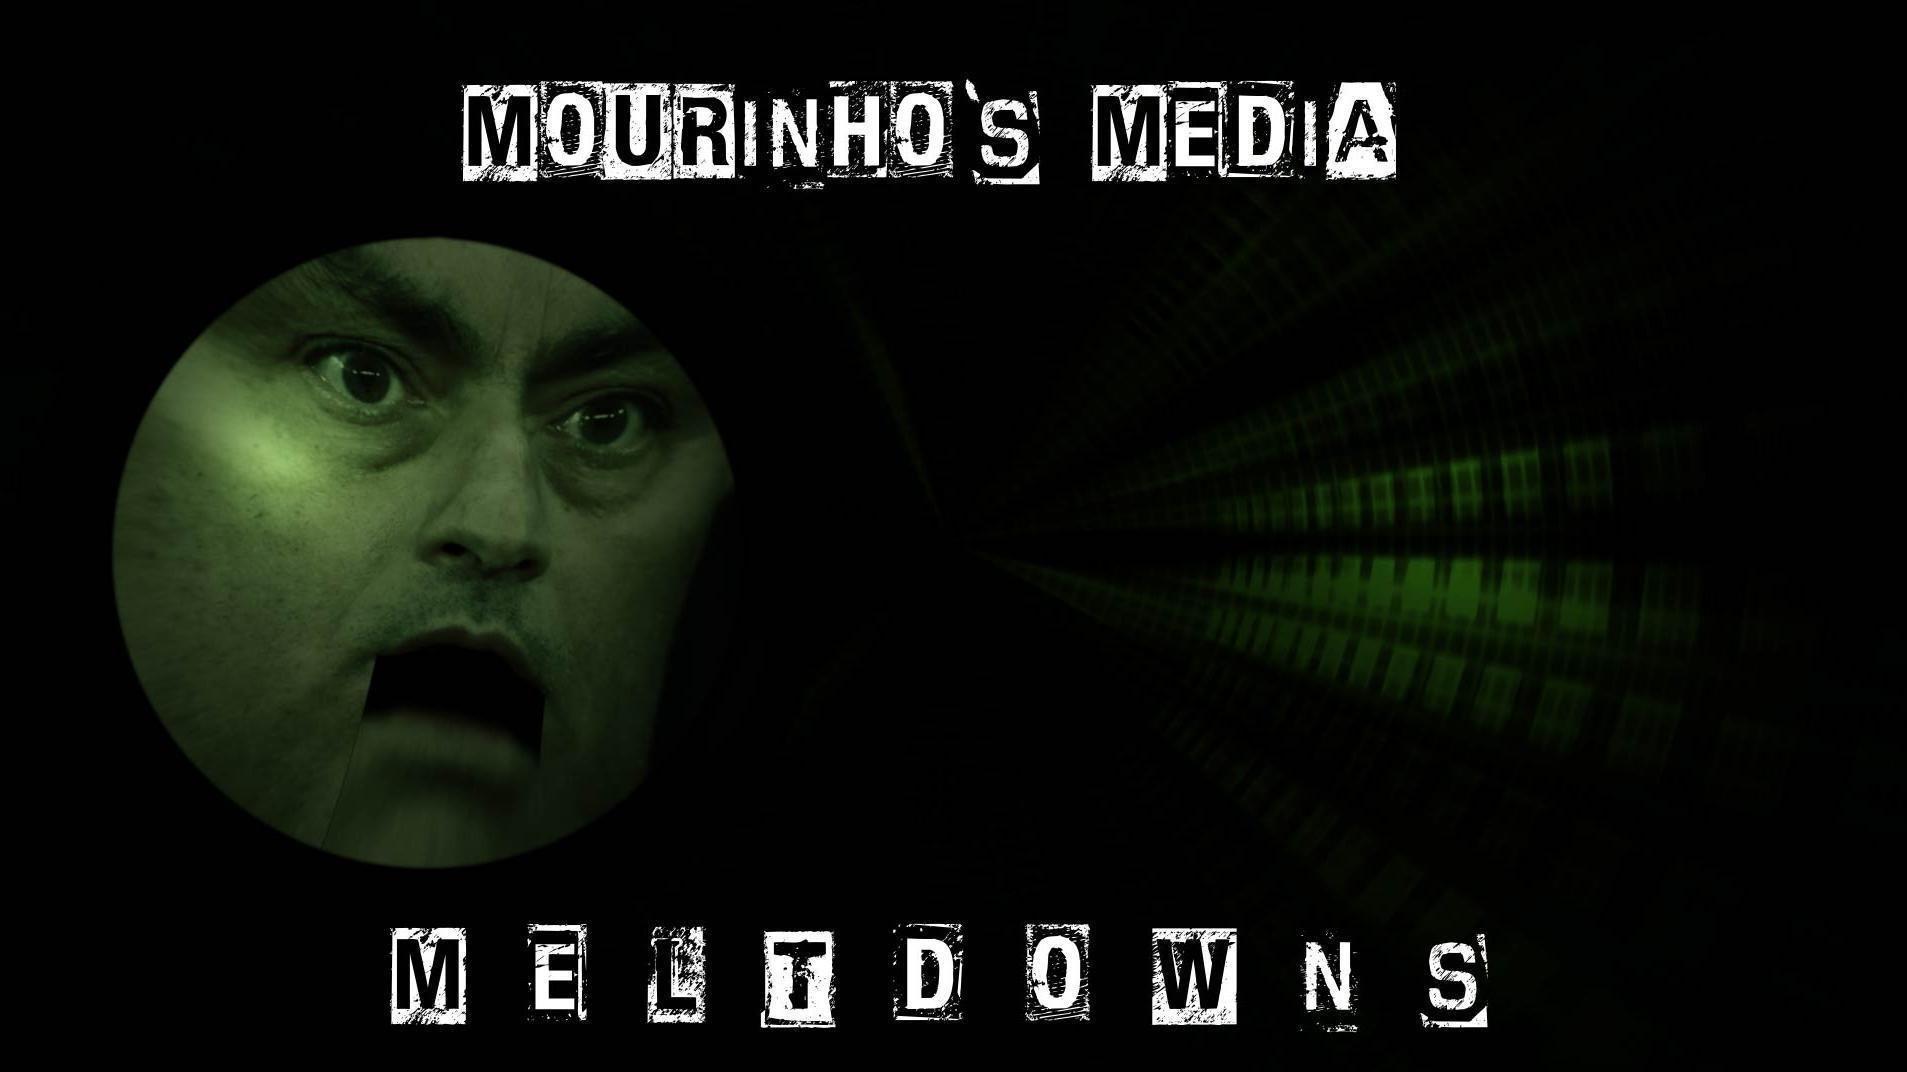 Mourinho's Meltdown 2018